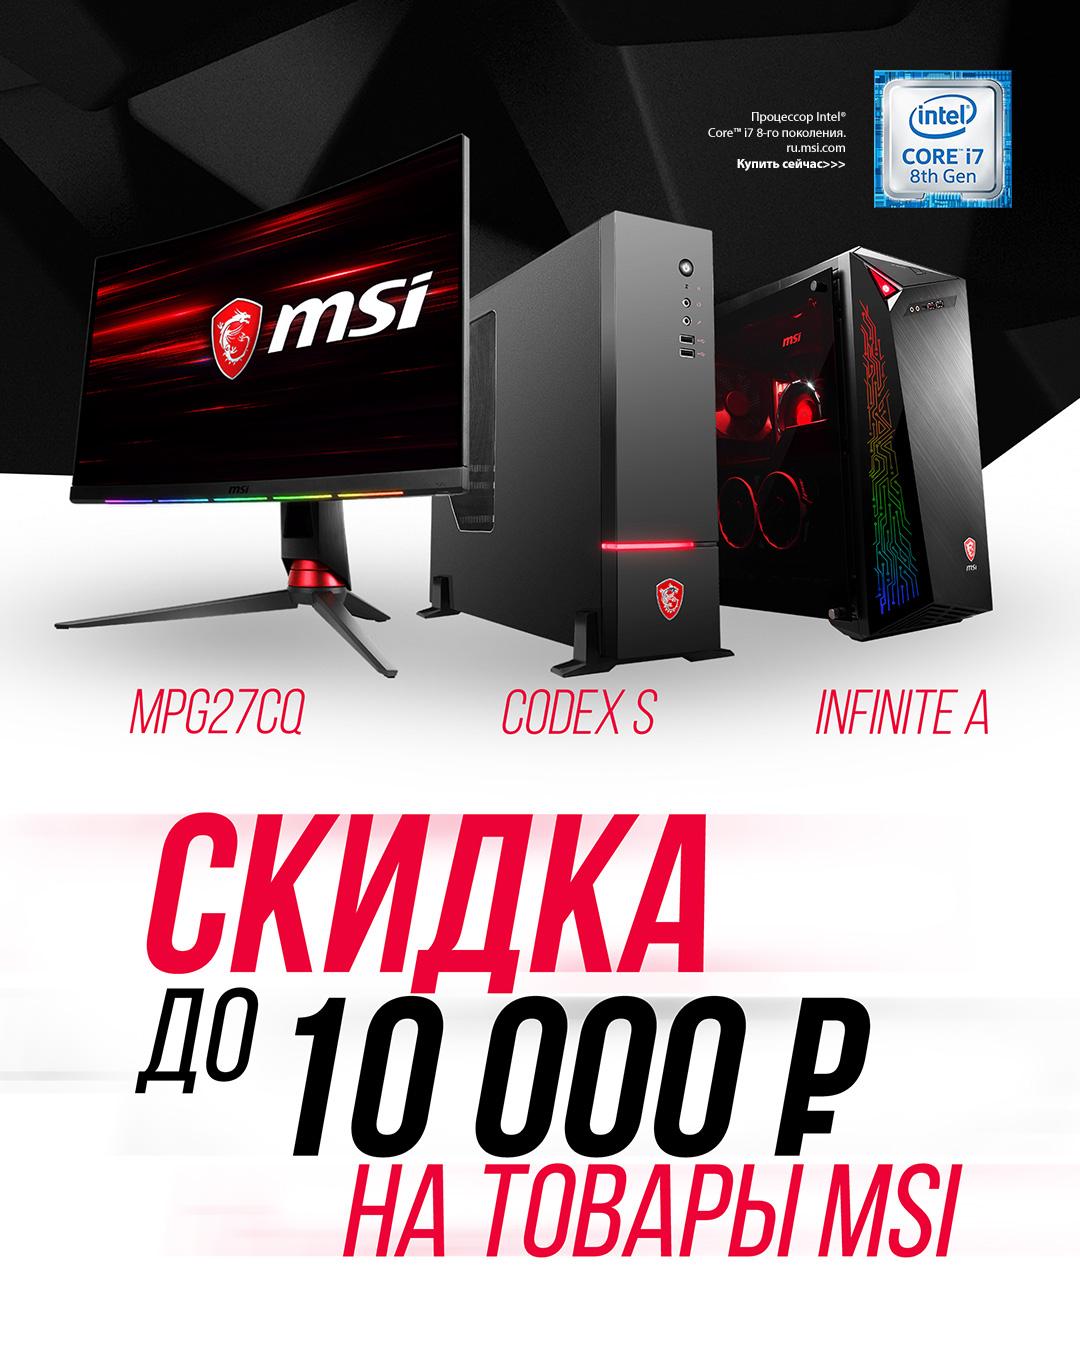 Скидка до 10 000 руб. на товары MSI в магазинах Домотехника